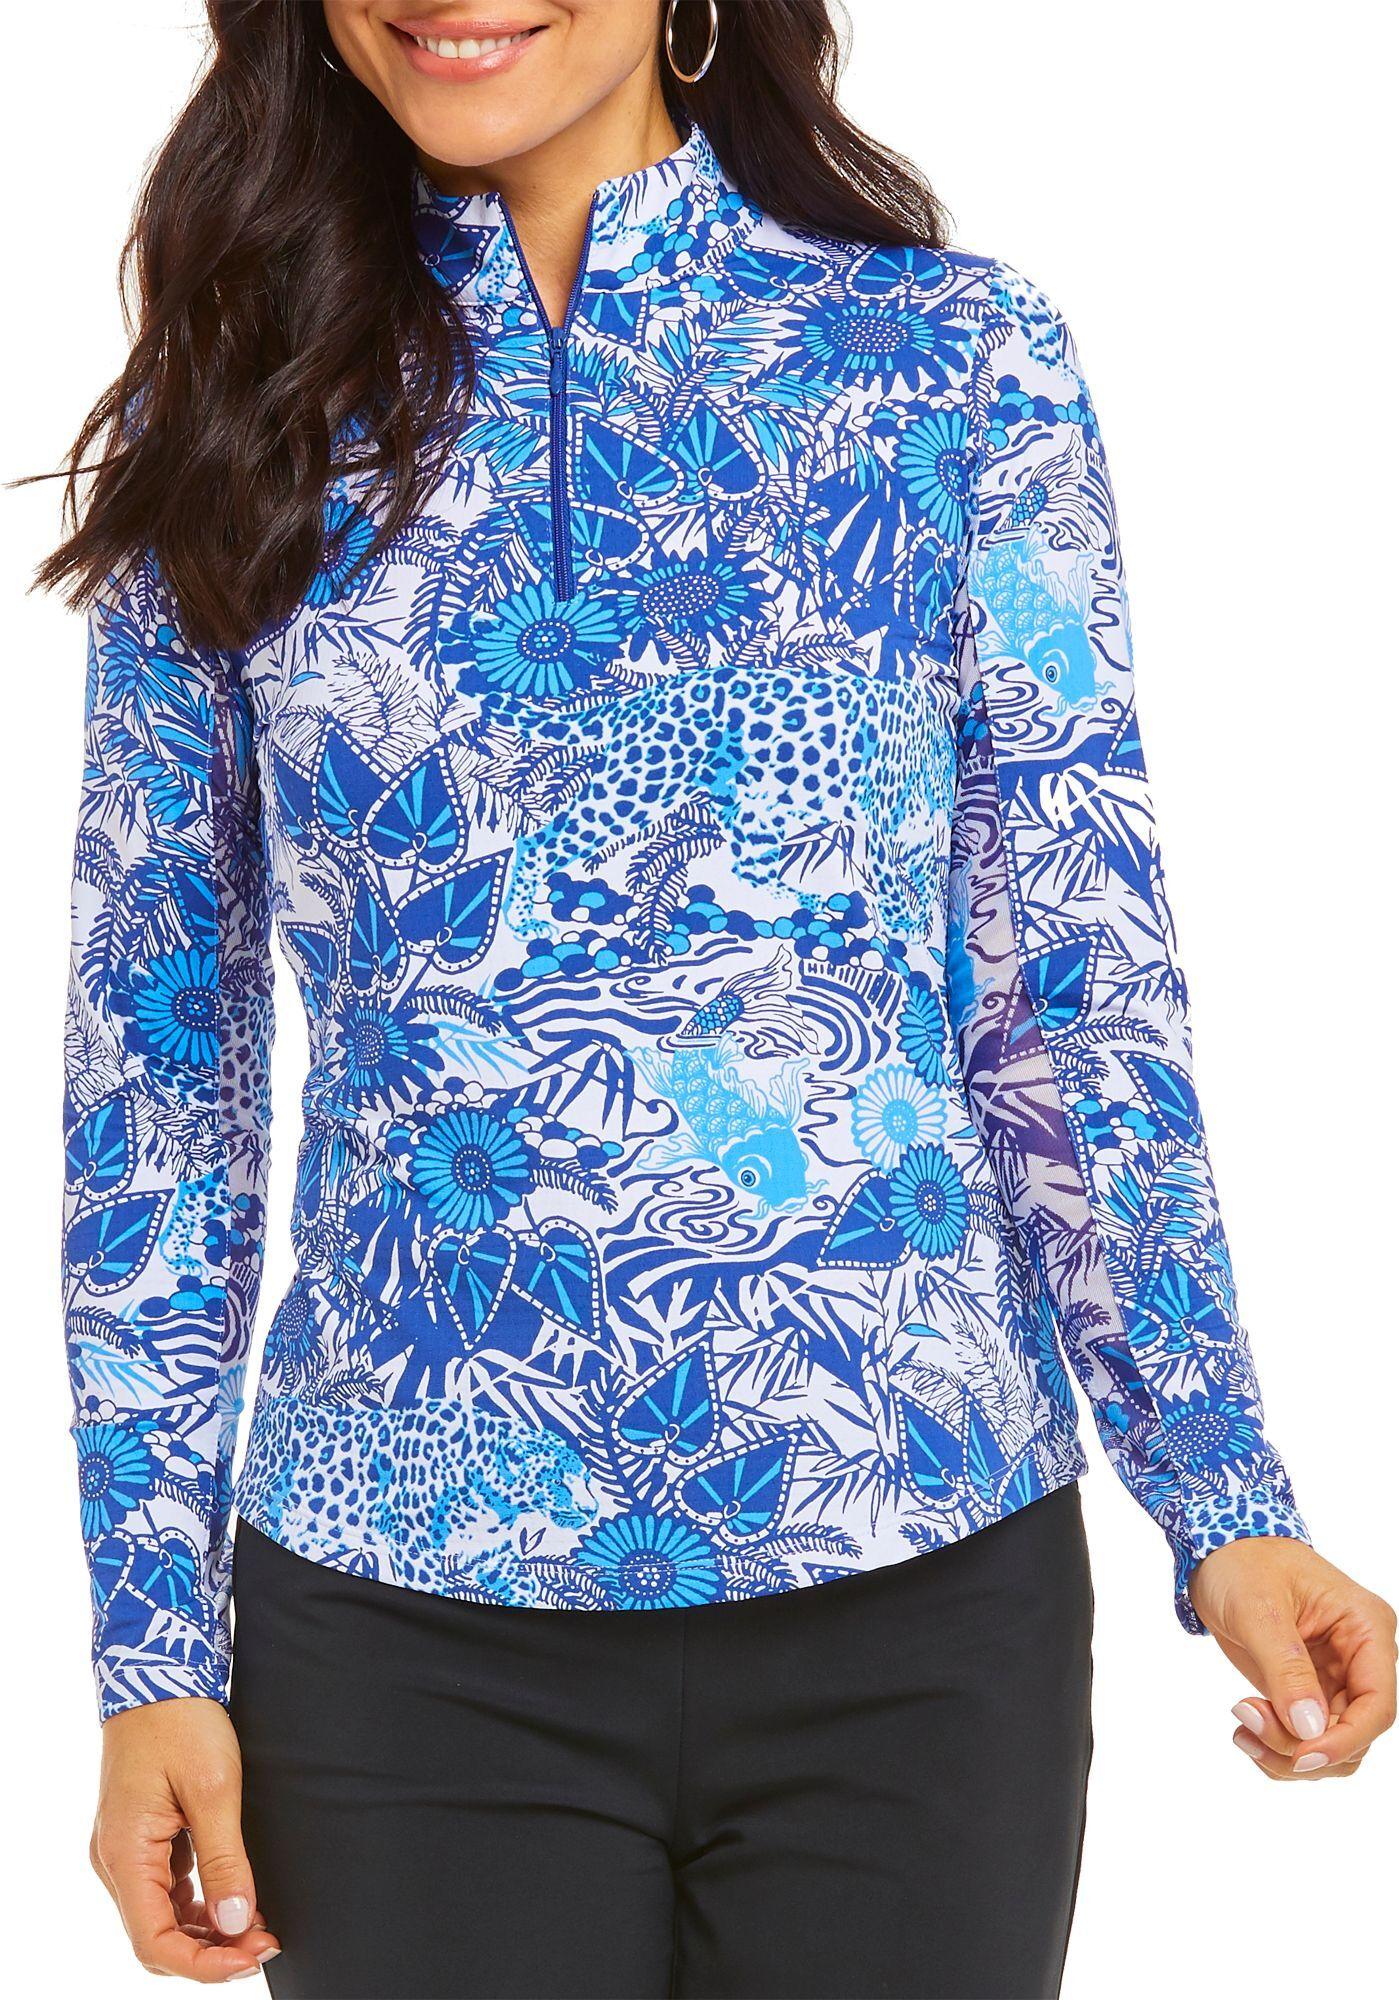 IBKUL Women's Hearts Mock Neck Long Sleeve Shirt, XS, Bamboo Garden Blue Tonal